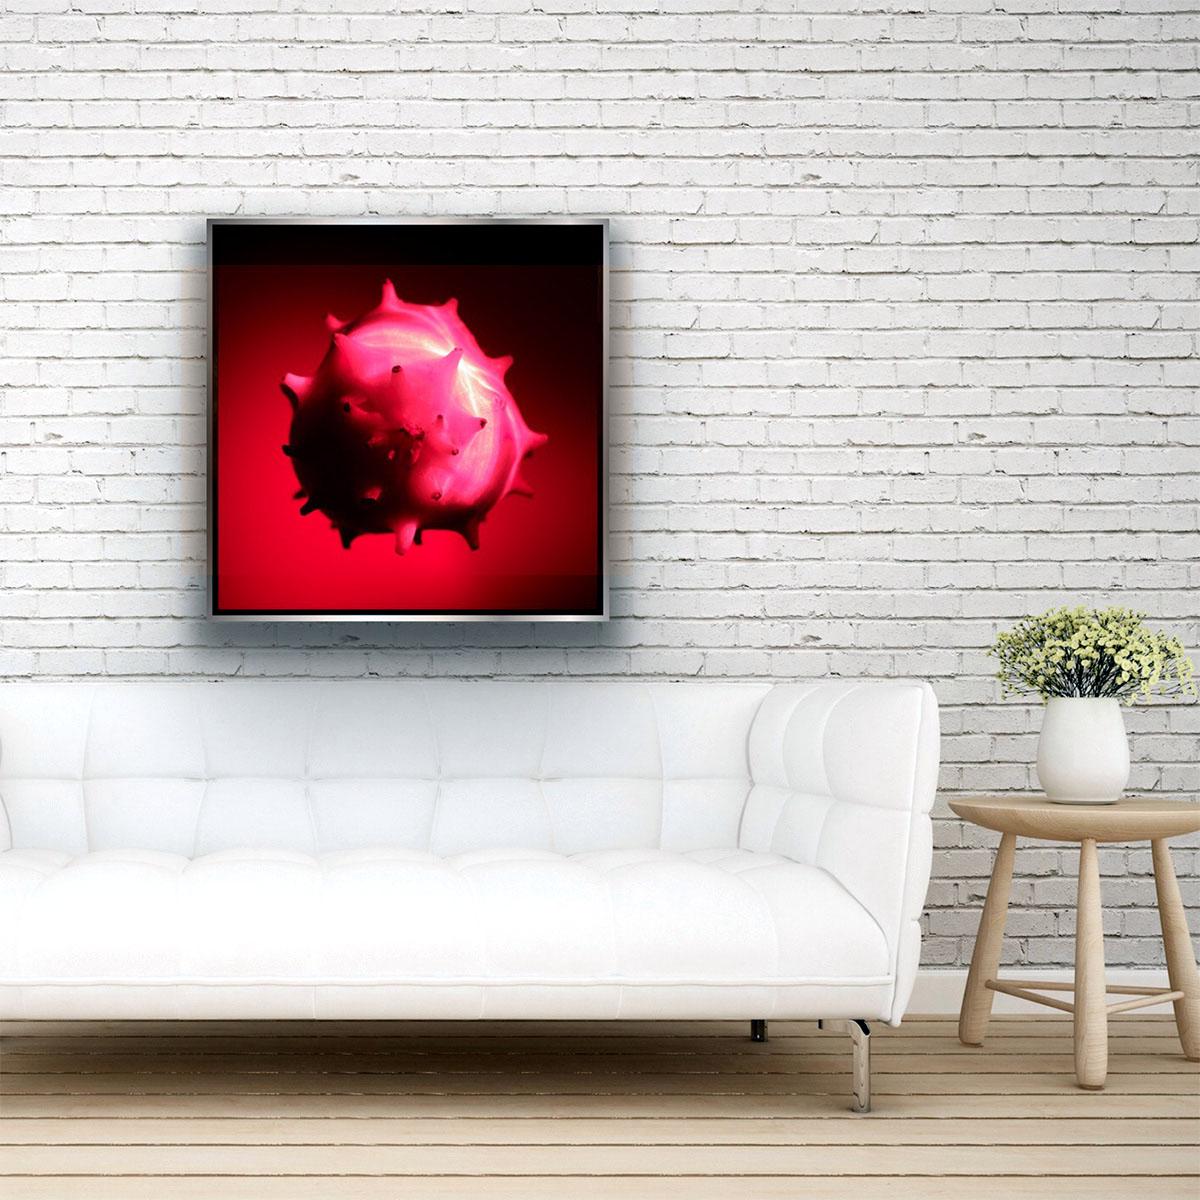 PIGASUS by Grete Hjorth-Johansen, viewed in a room